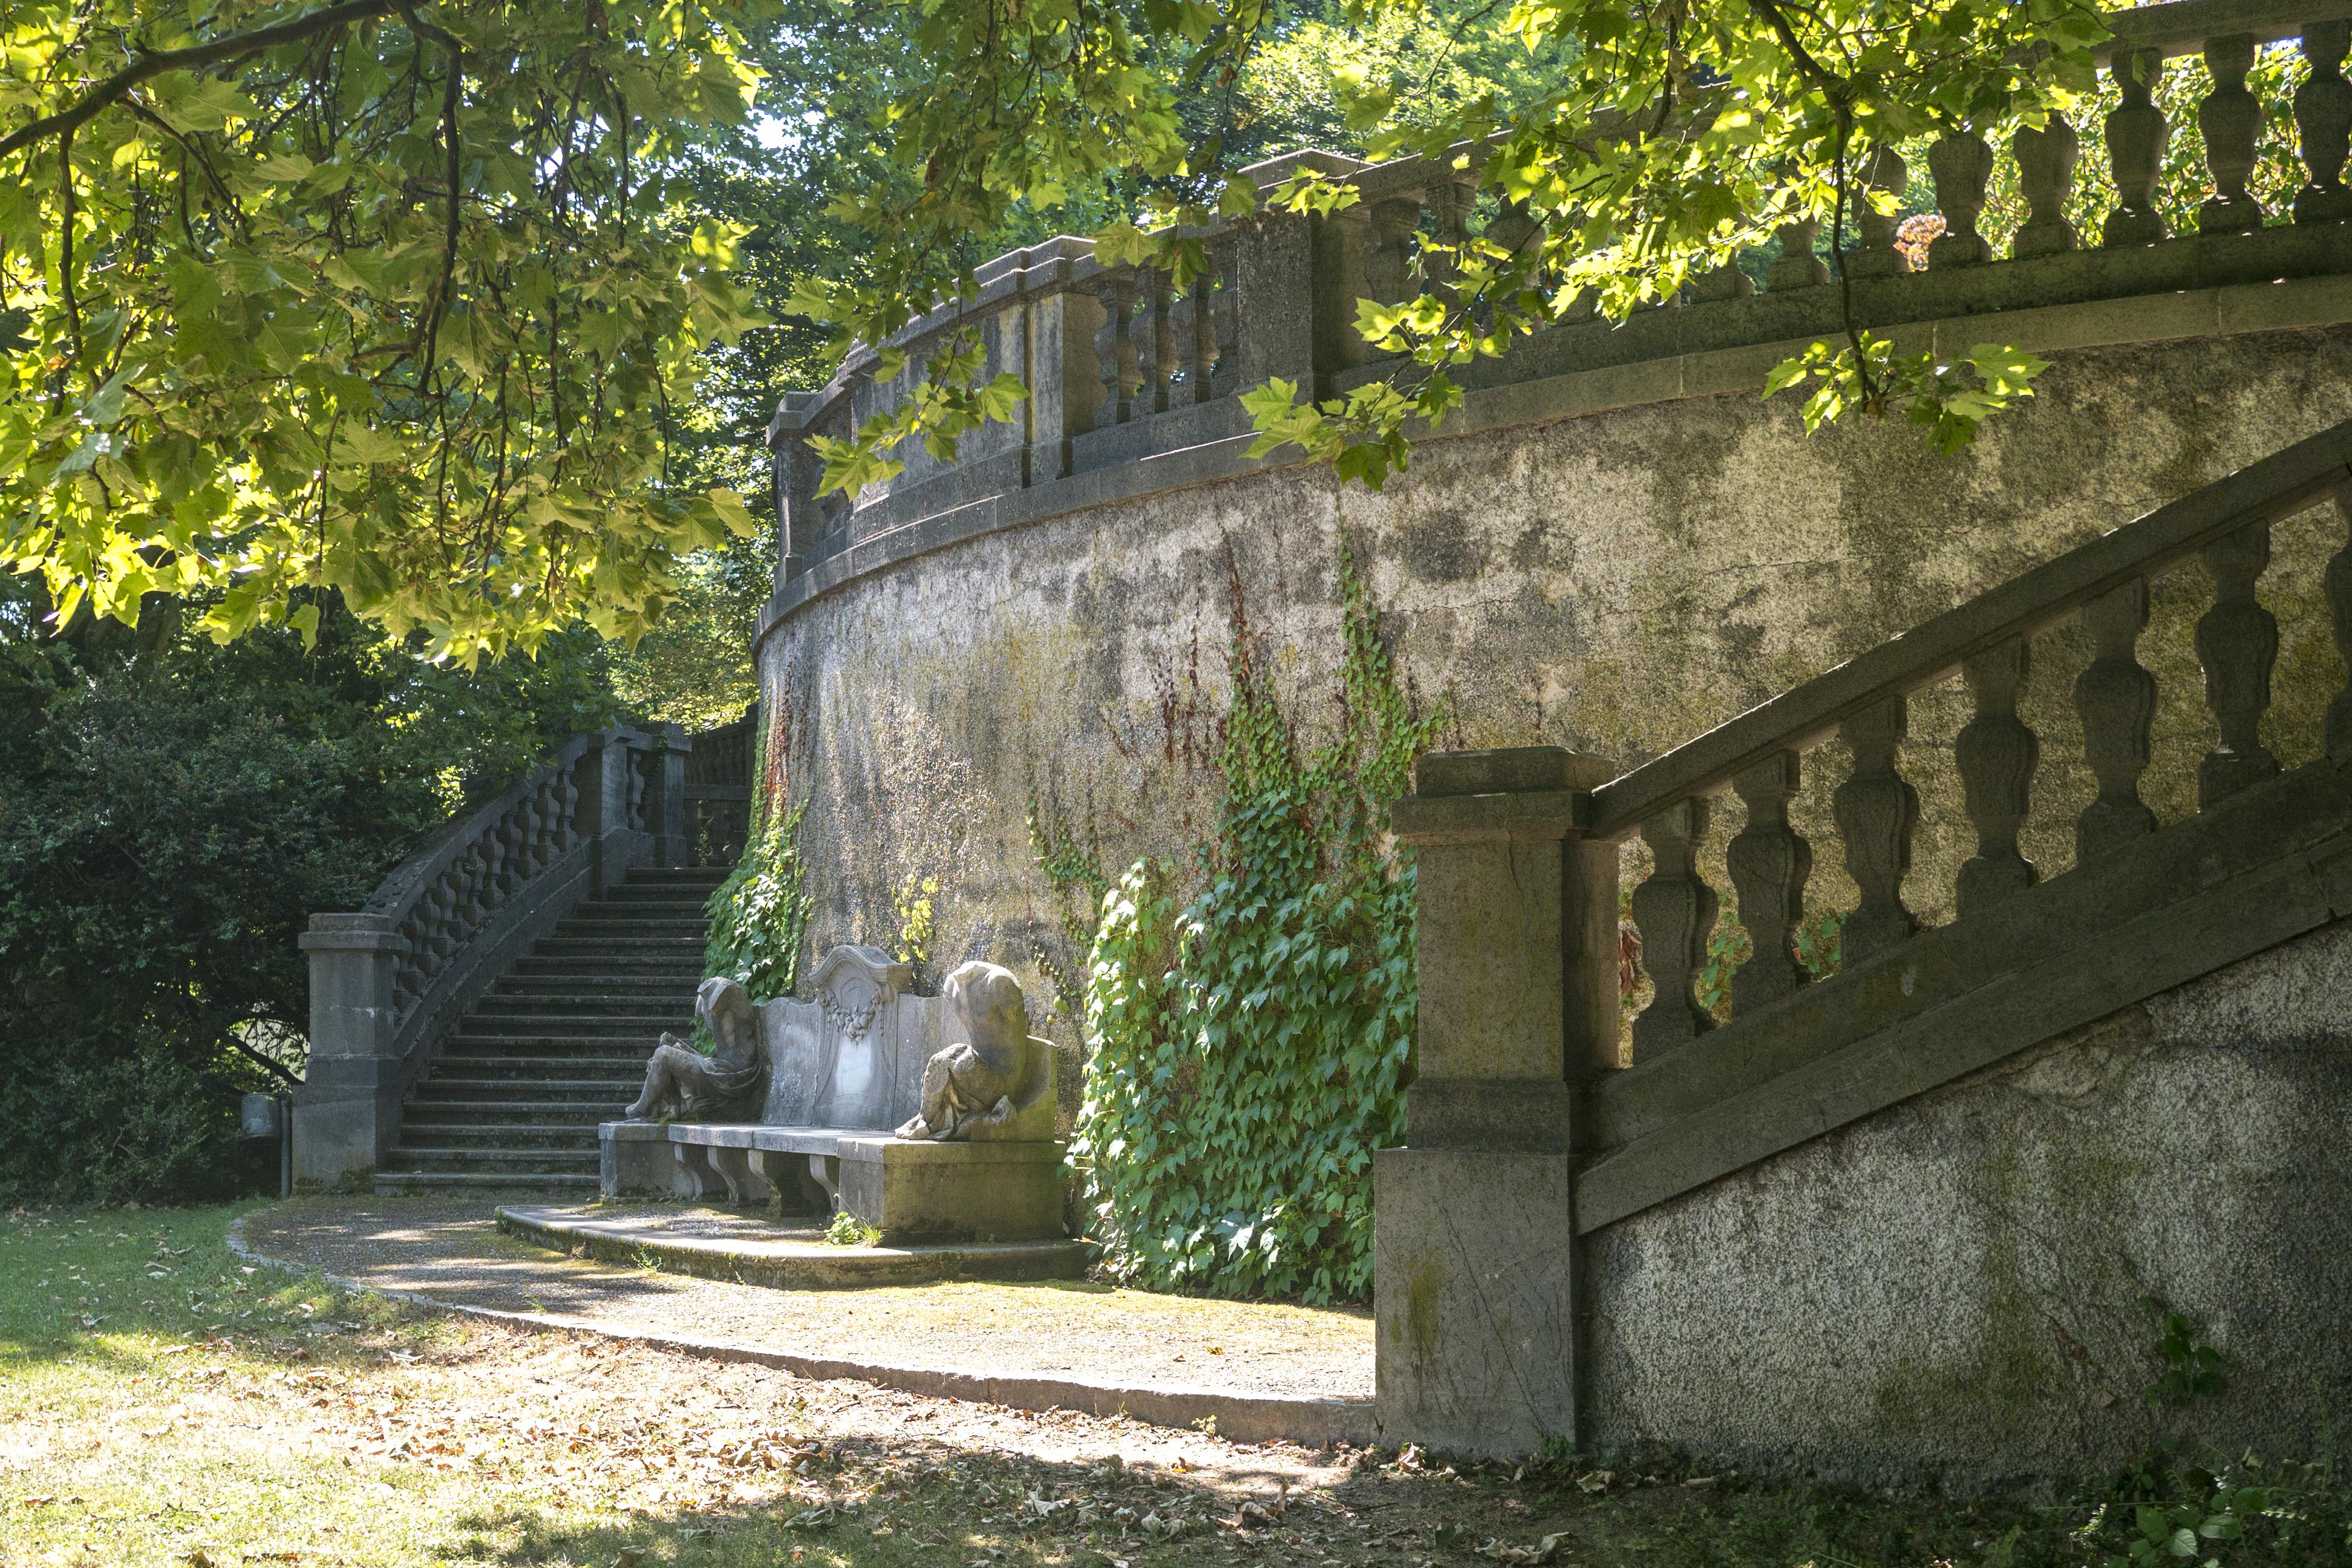 Gartenbau Linz file linz hatschekvilla gartenbaudenkmal 11 jpg wikimedia commons